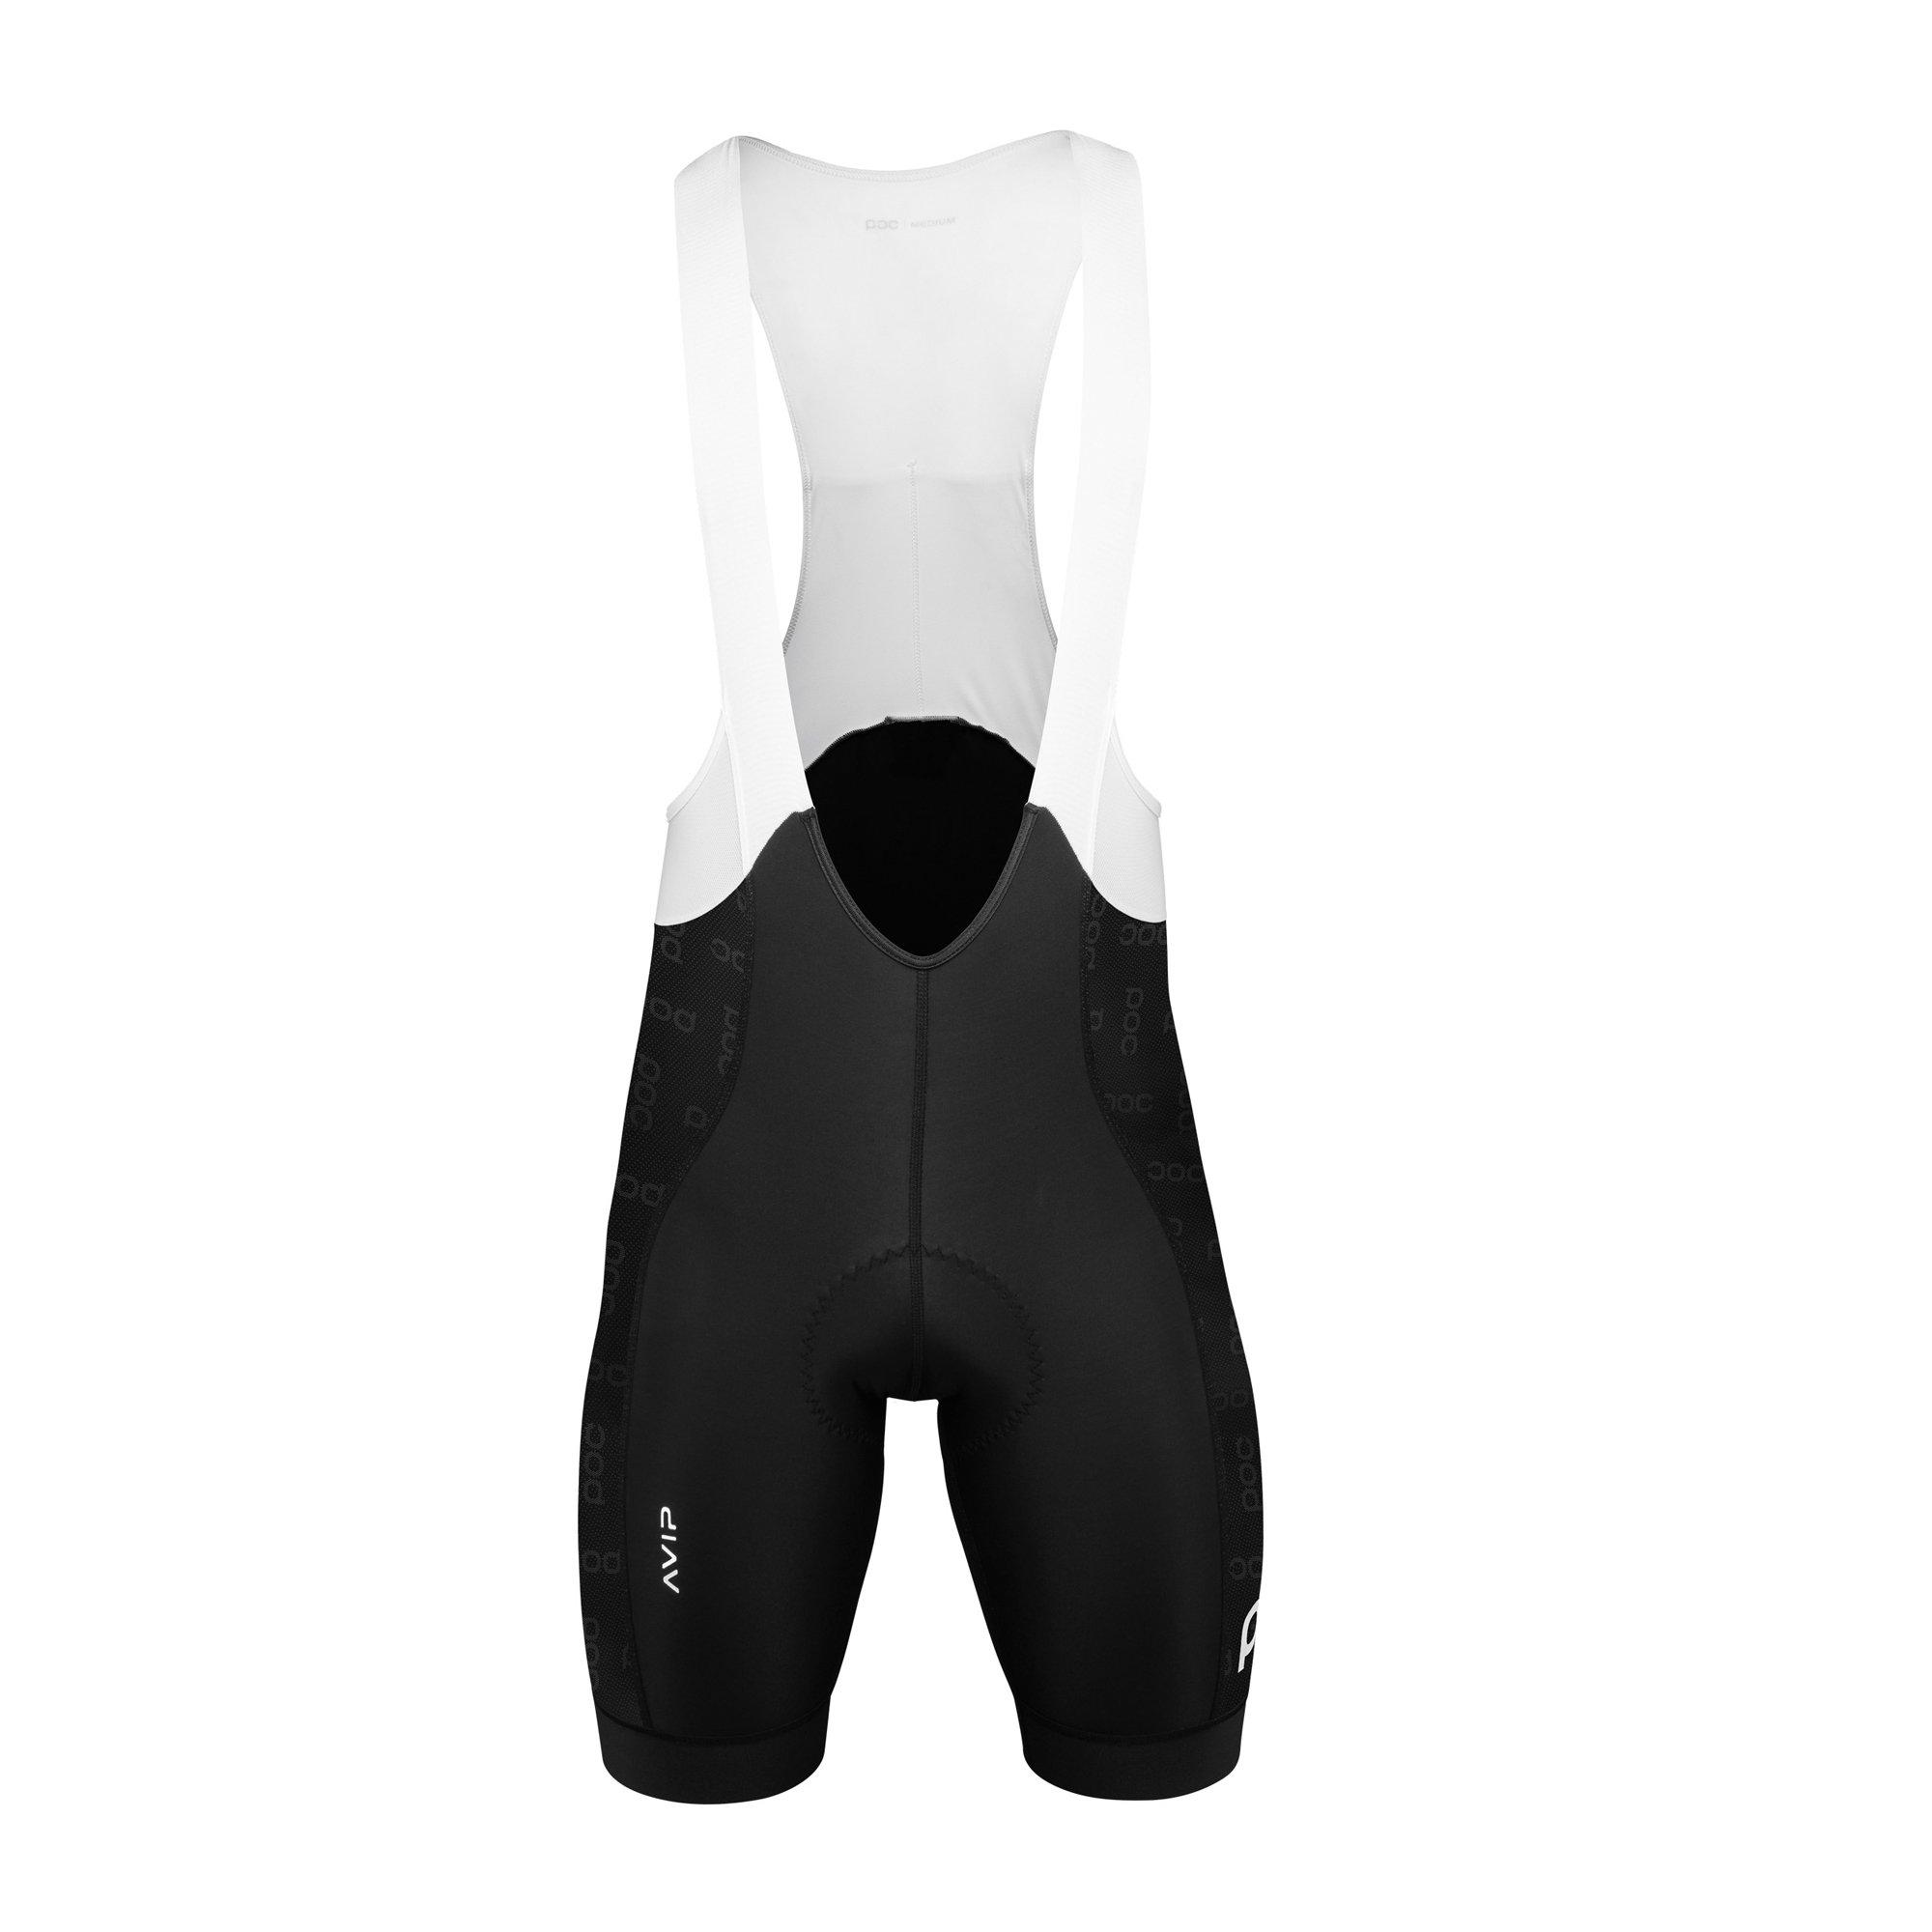 POC AVIP Ceramic VPDs Bib Shorts, Cycling Apparel, Uranium Black, XL